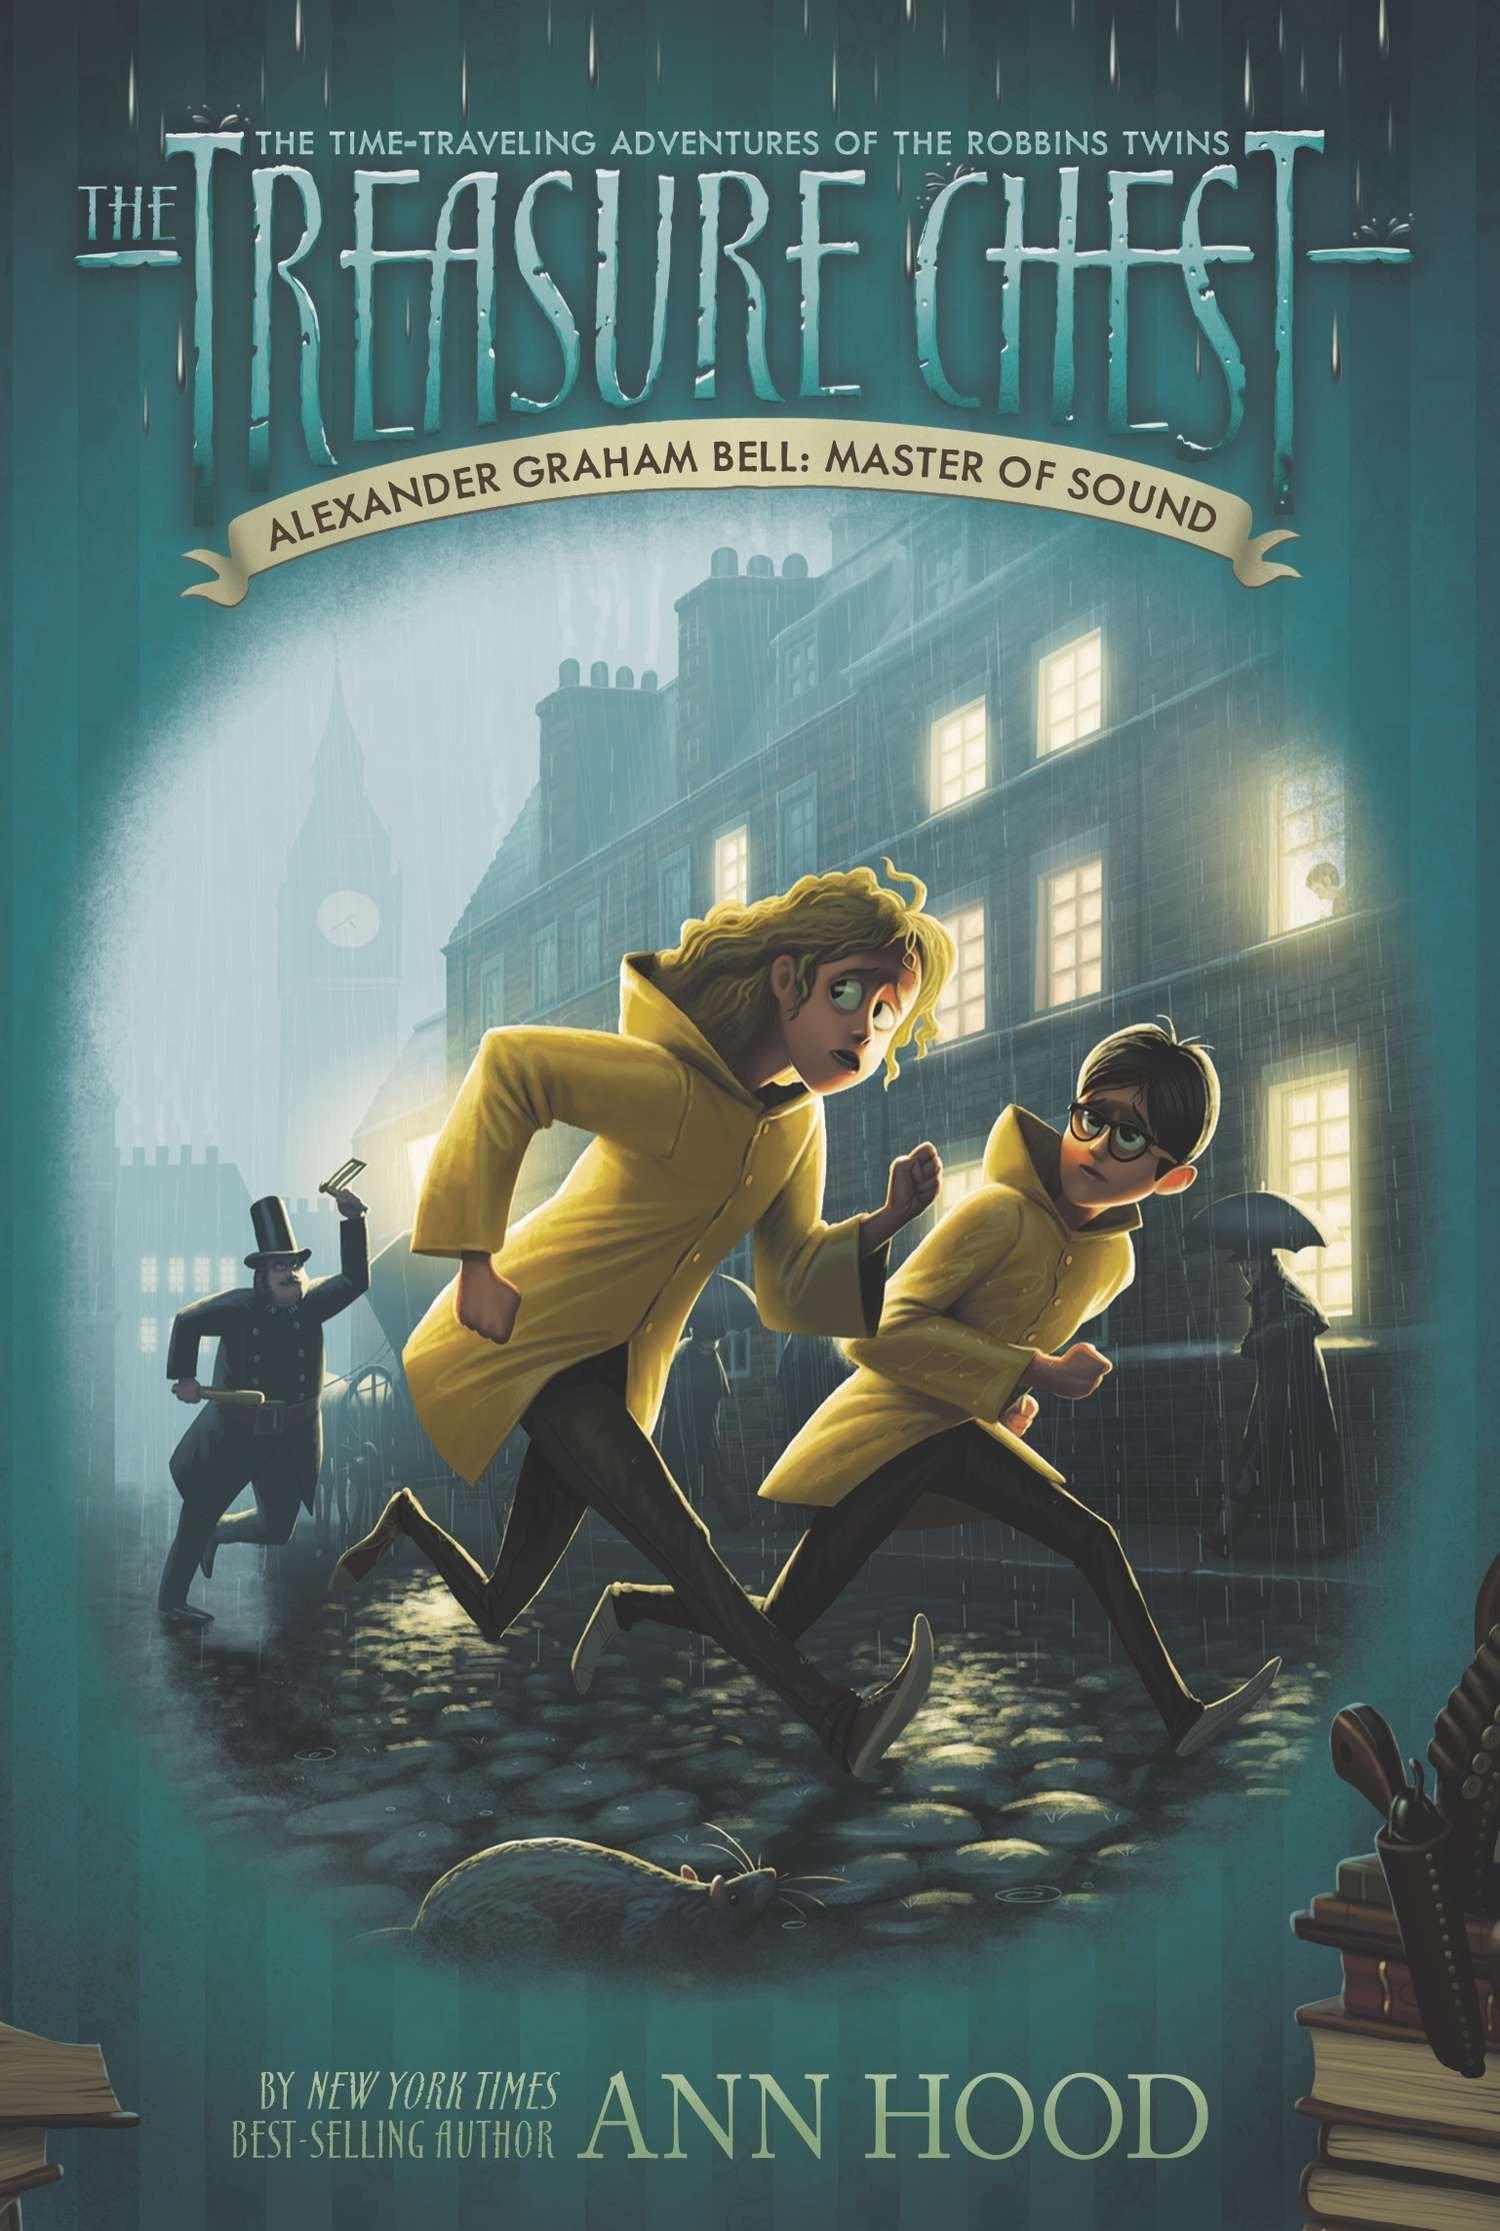 Alexander Graham Bell #7: Master of Sound (The Treasure Chest) ebook